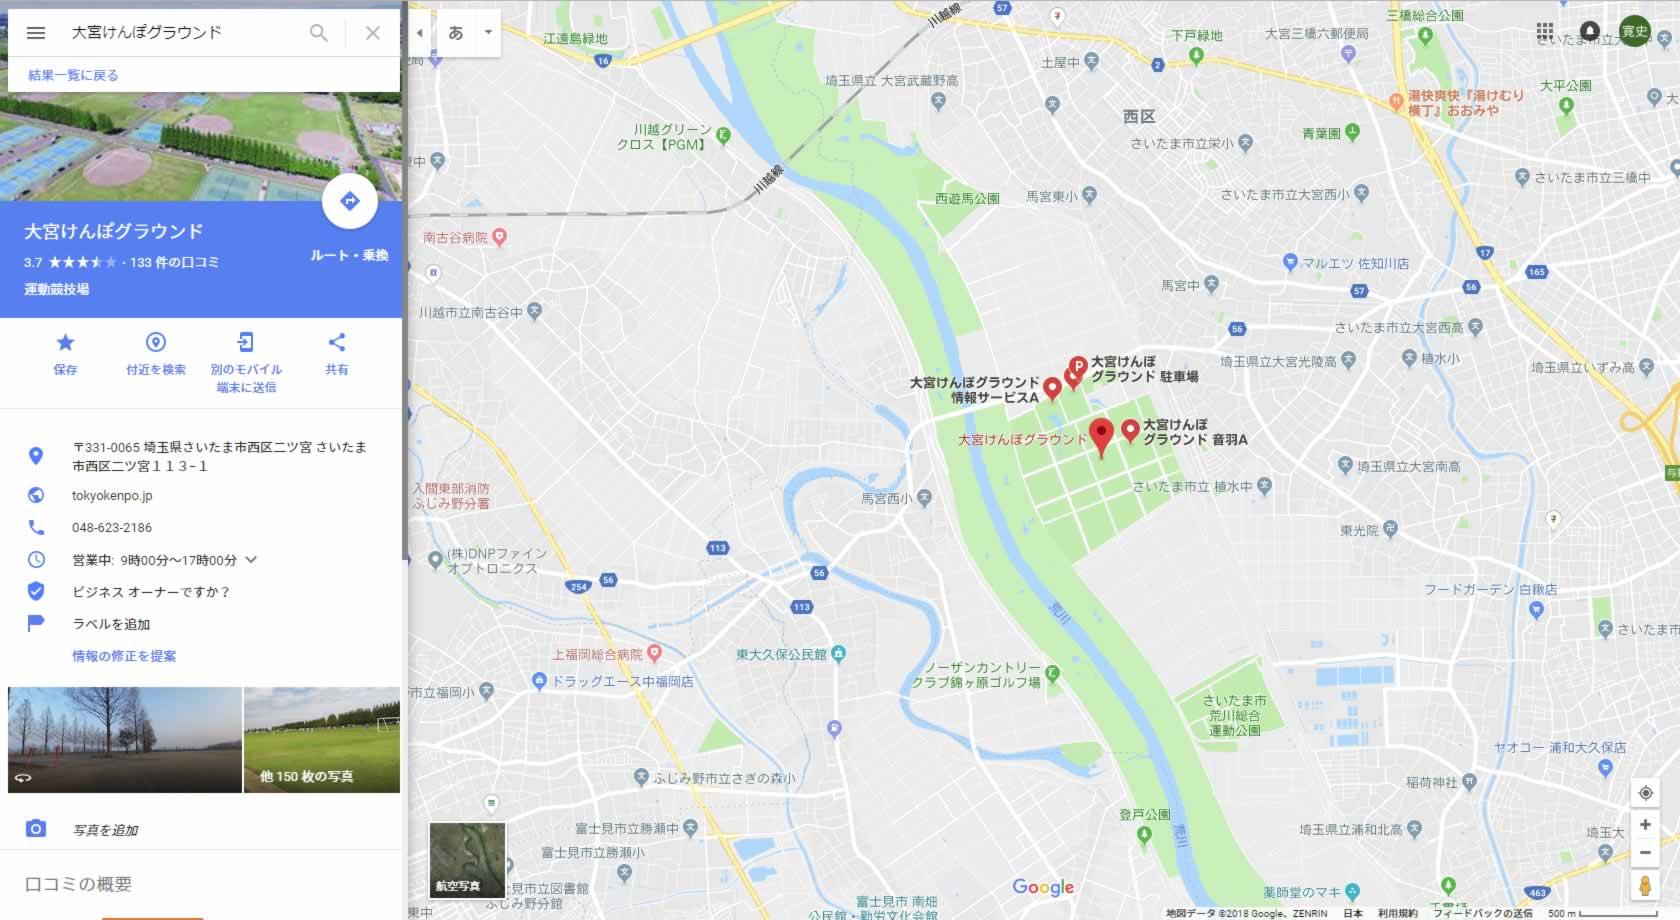 sports_fes2018_map